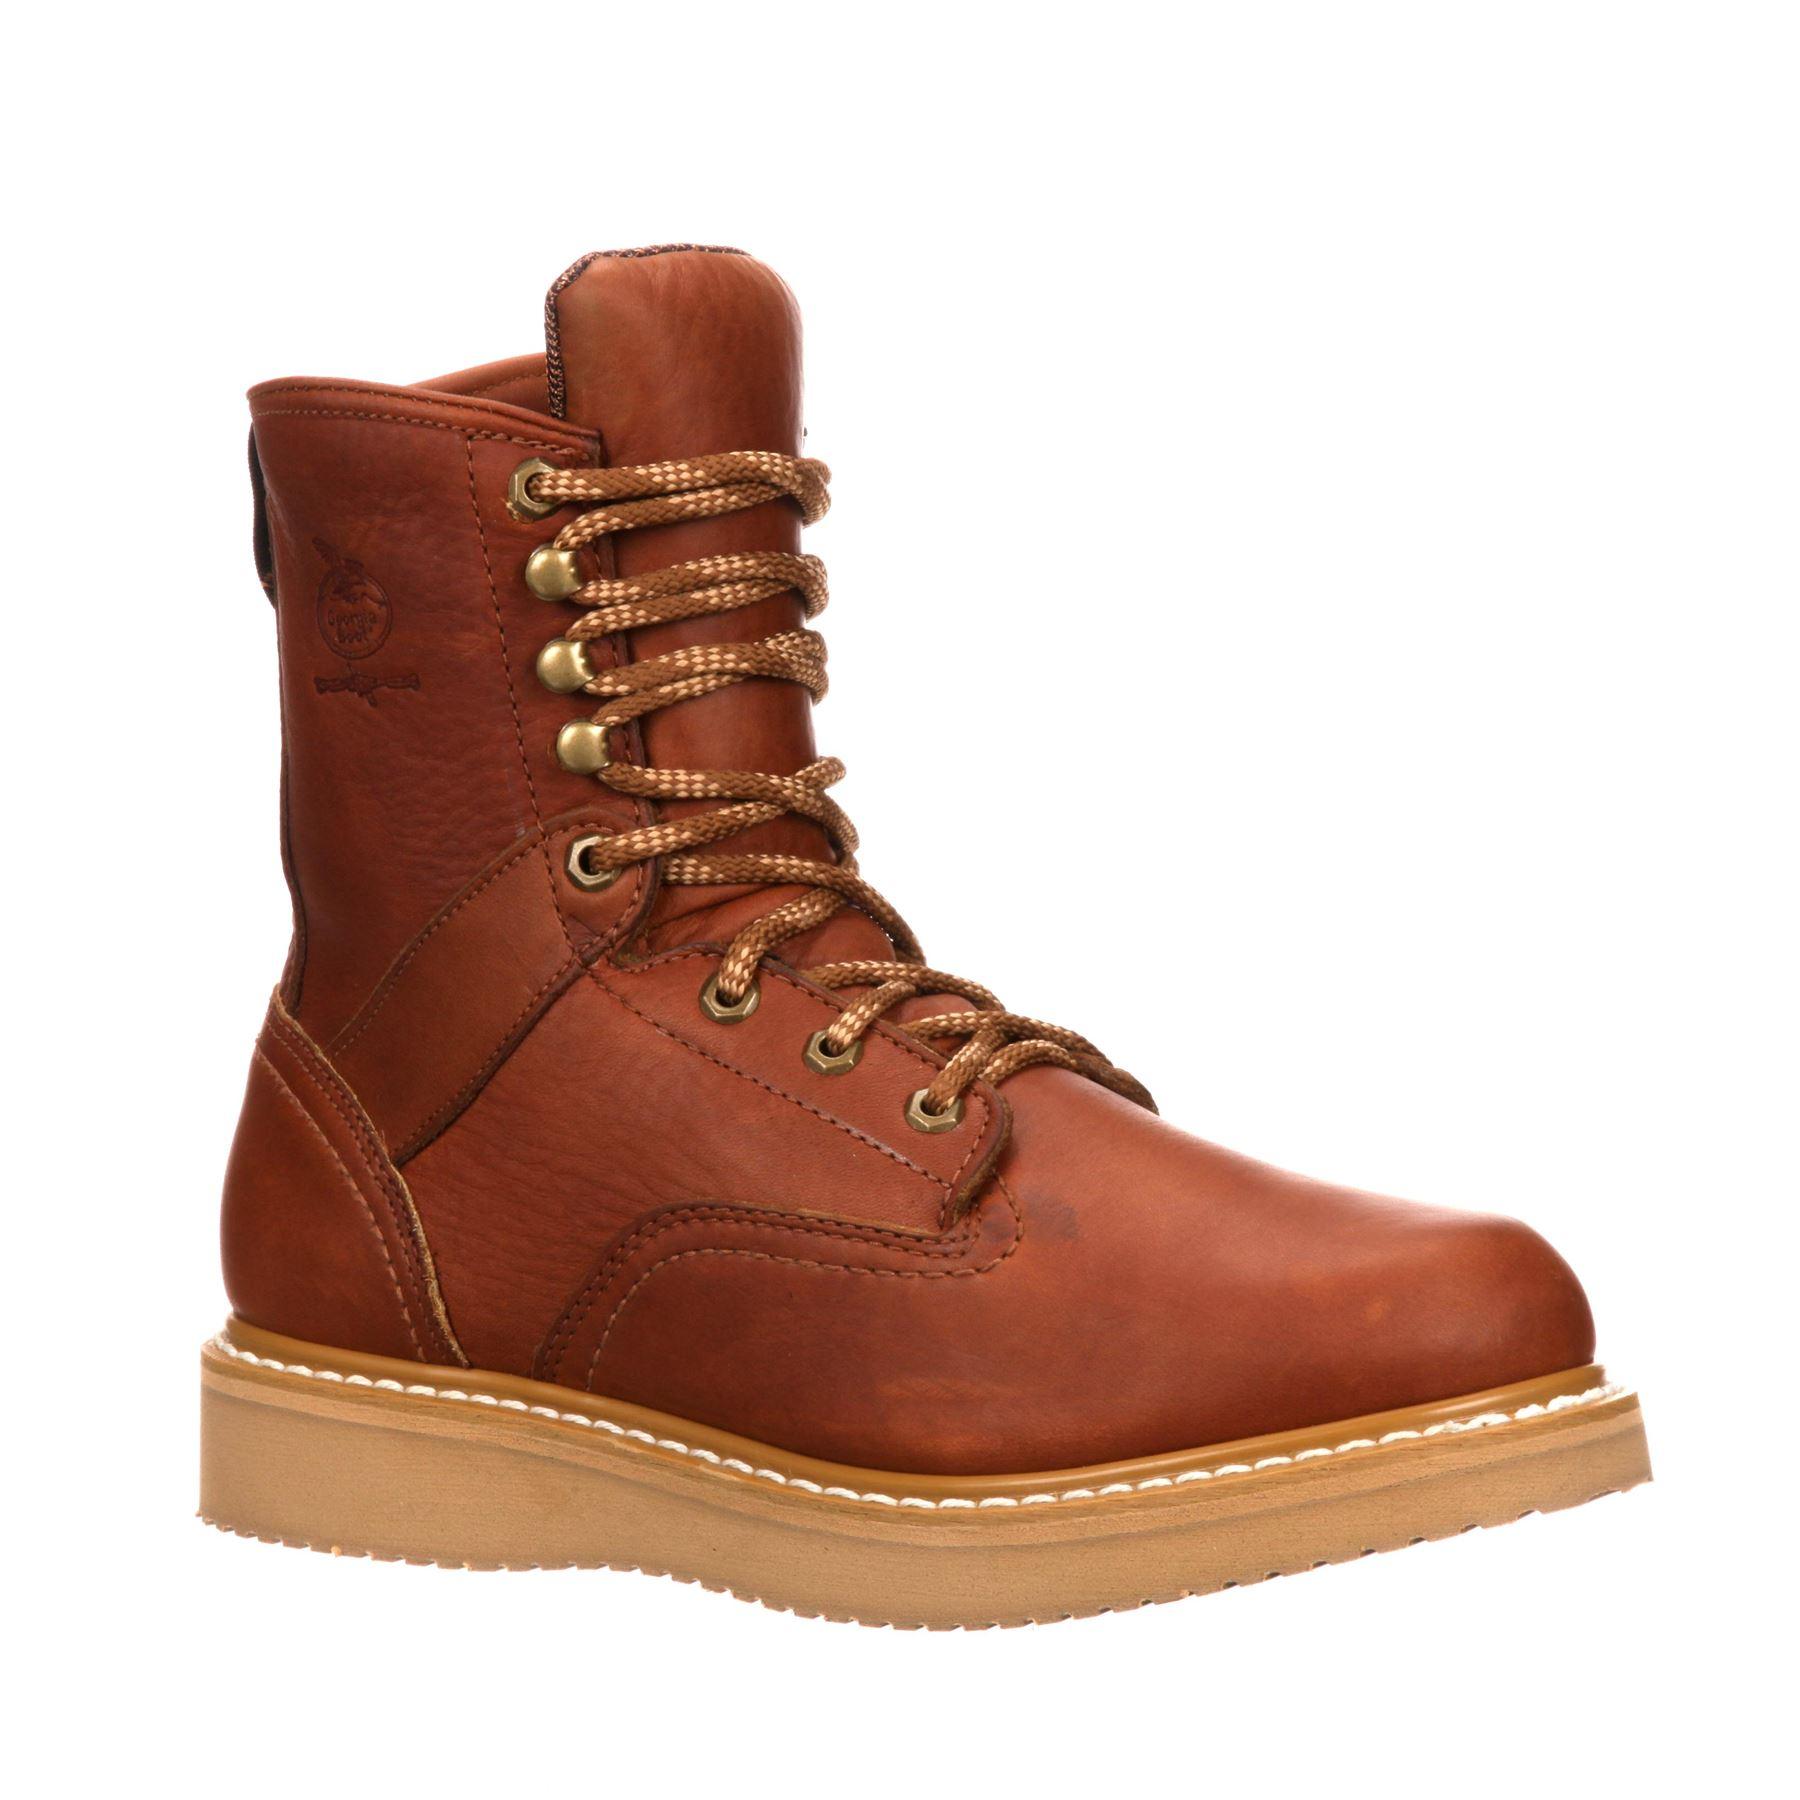 mens steel toe wedge work boots ebay